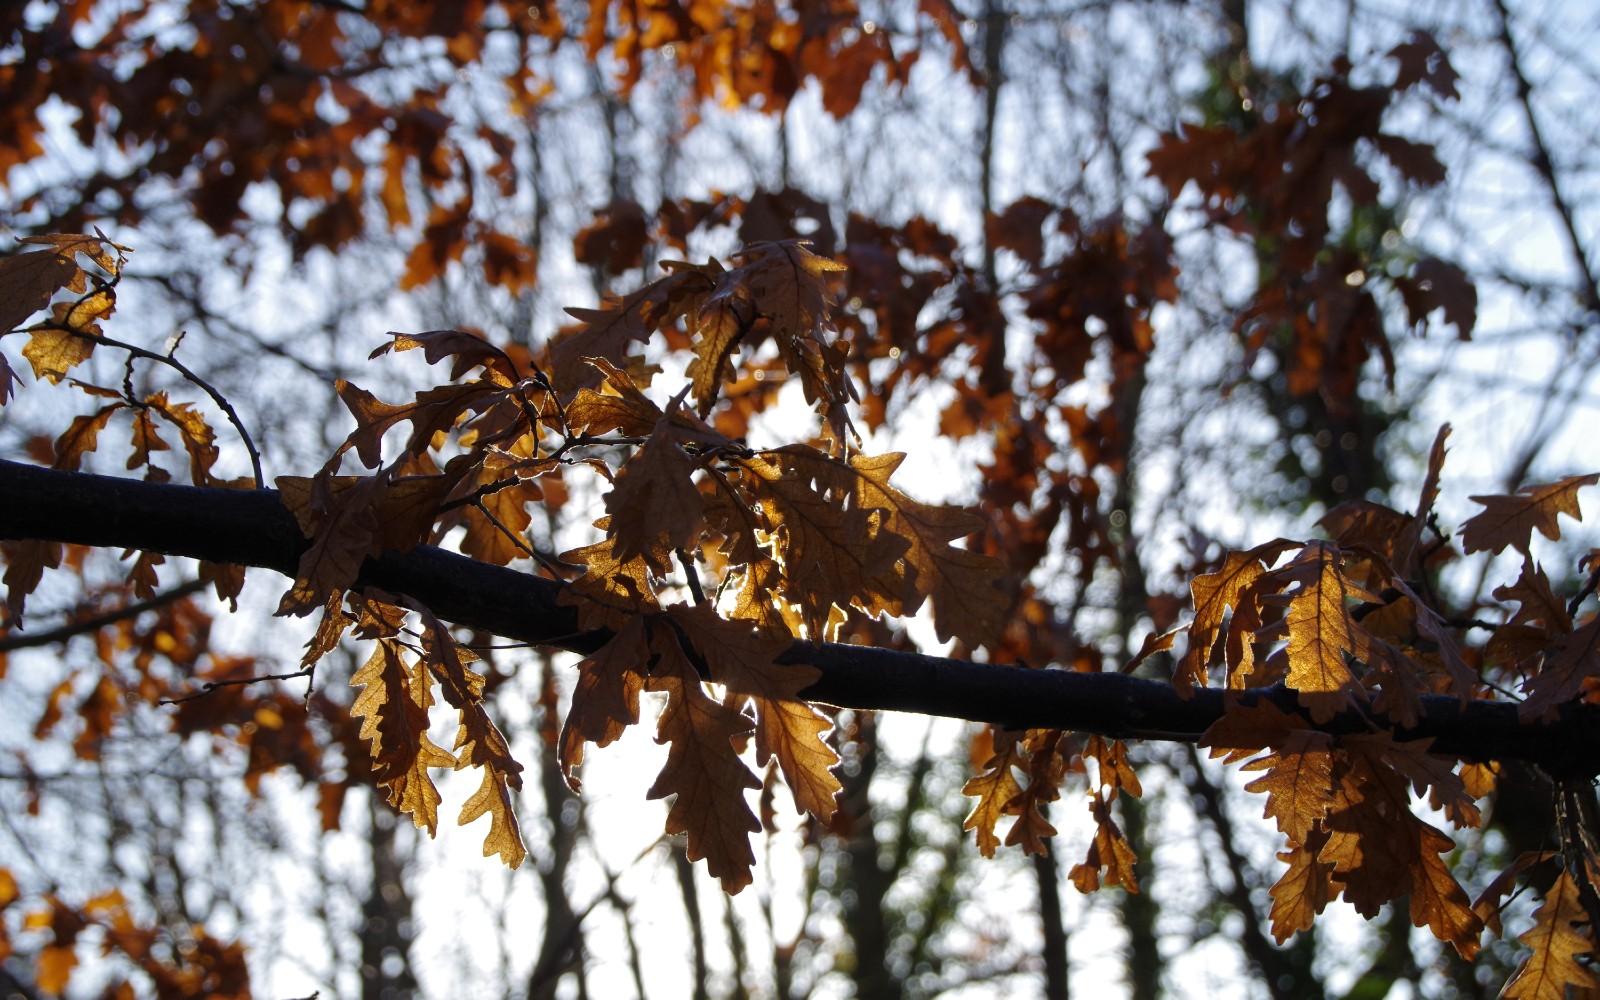 Autumn Leaves in Dibbinsdale